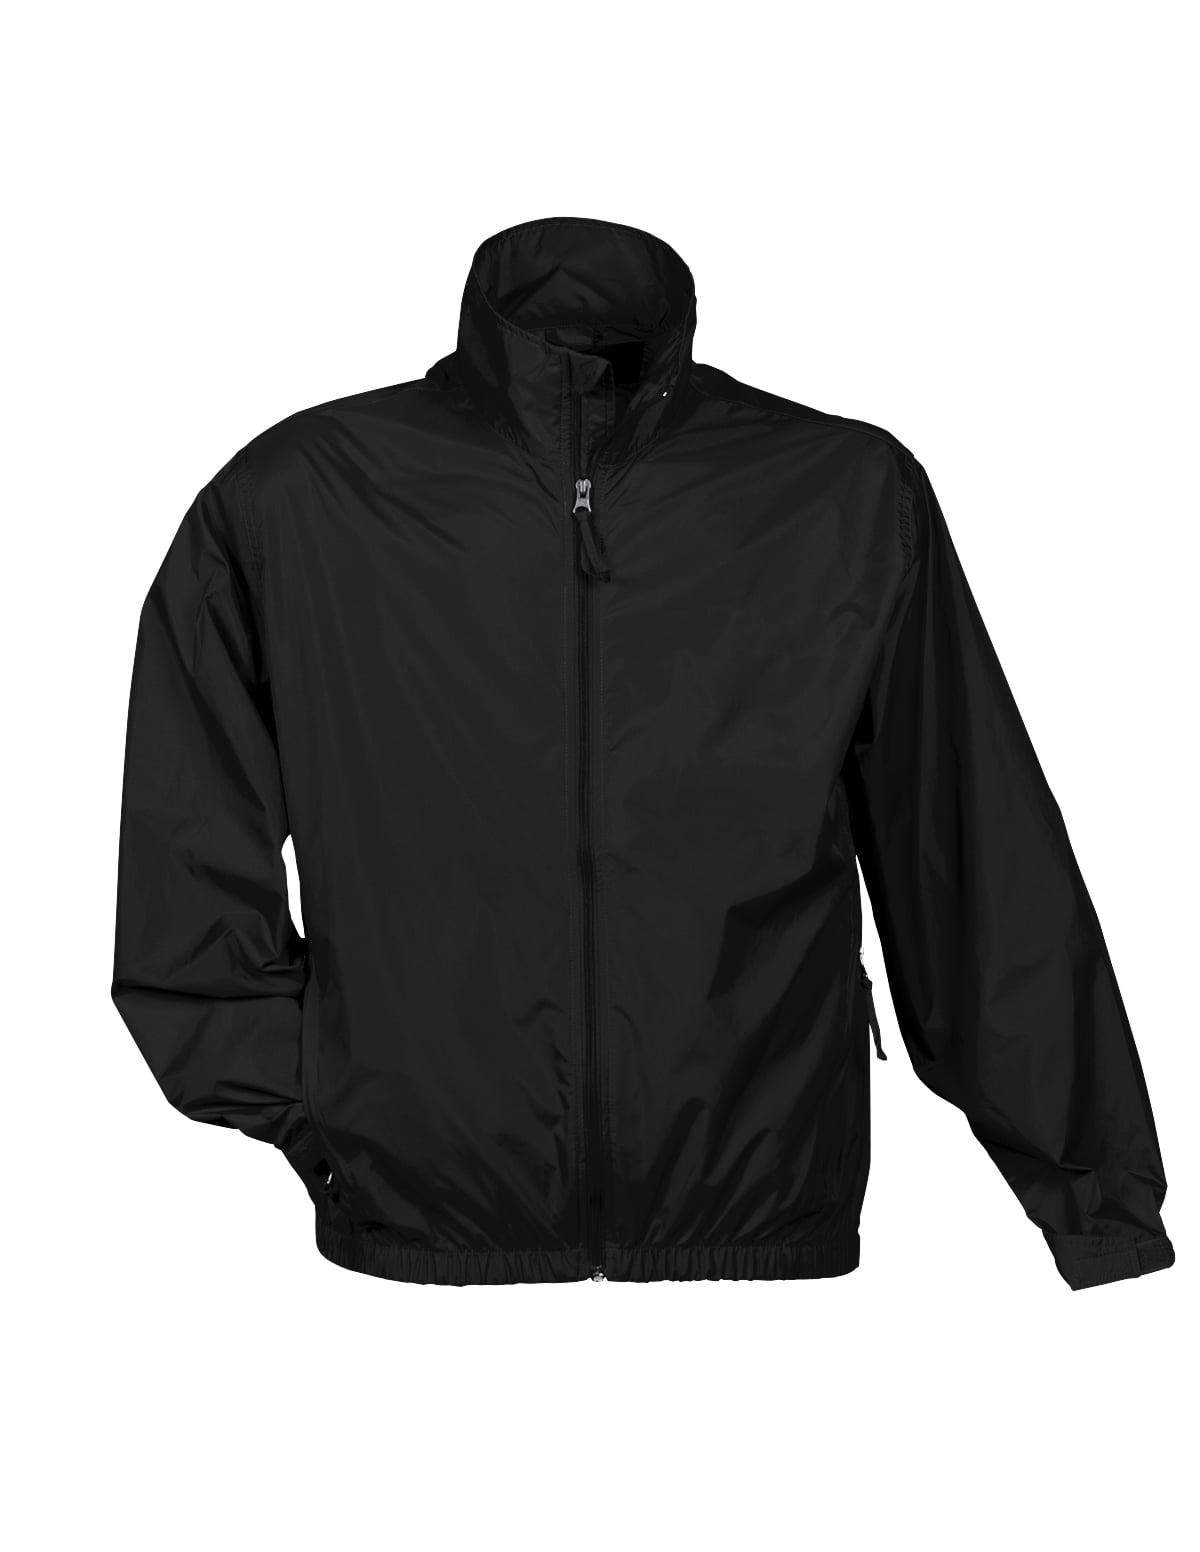 Tri-Mountain Atlas 1700 Unlined nylon jacket, 2X-Large, Black